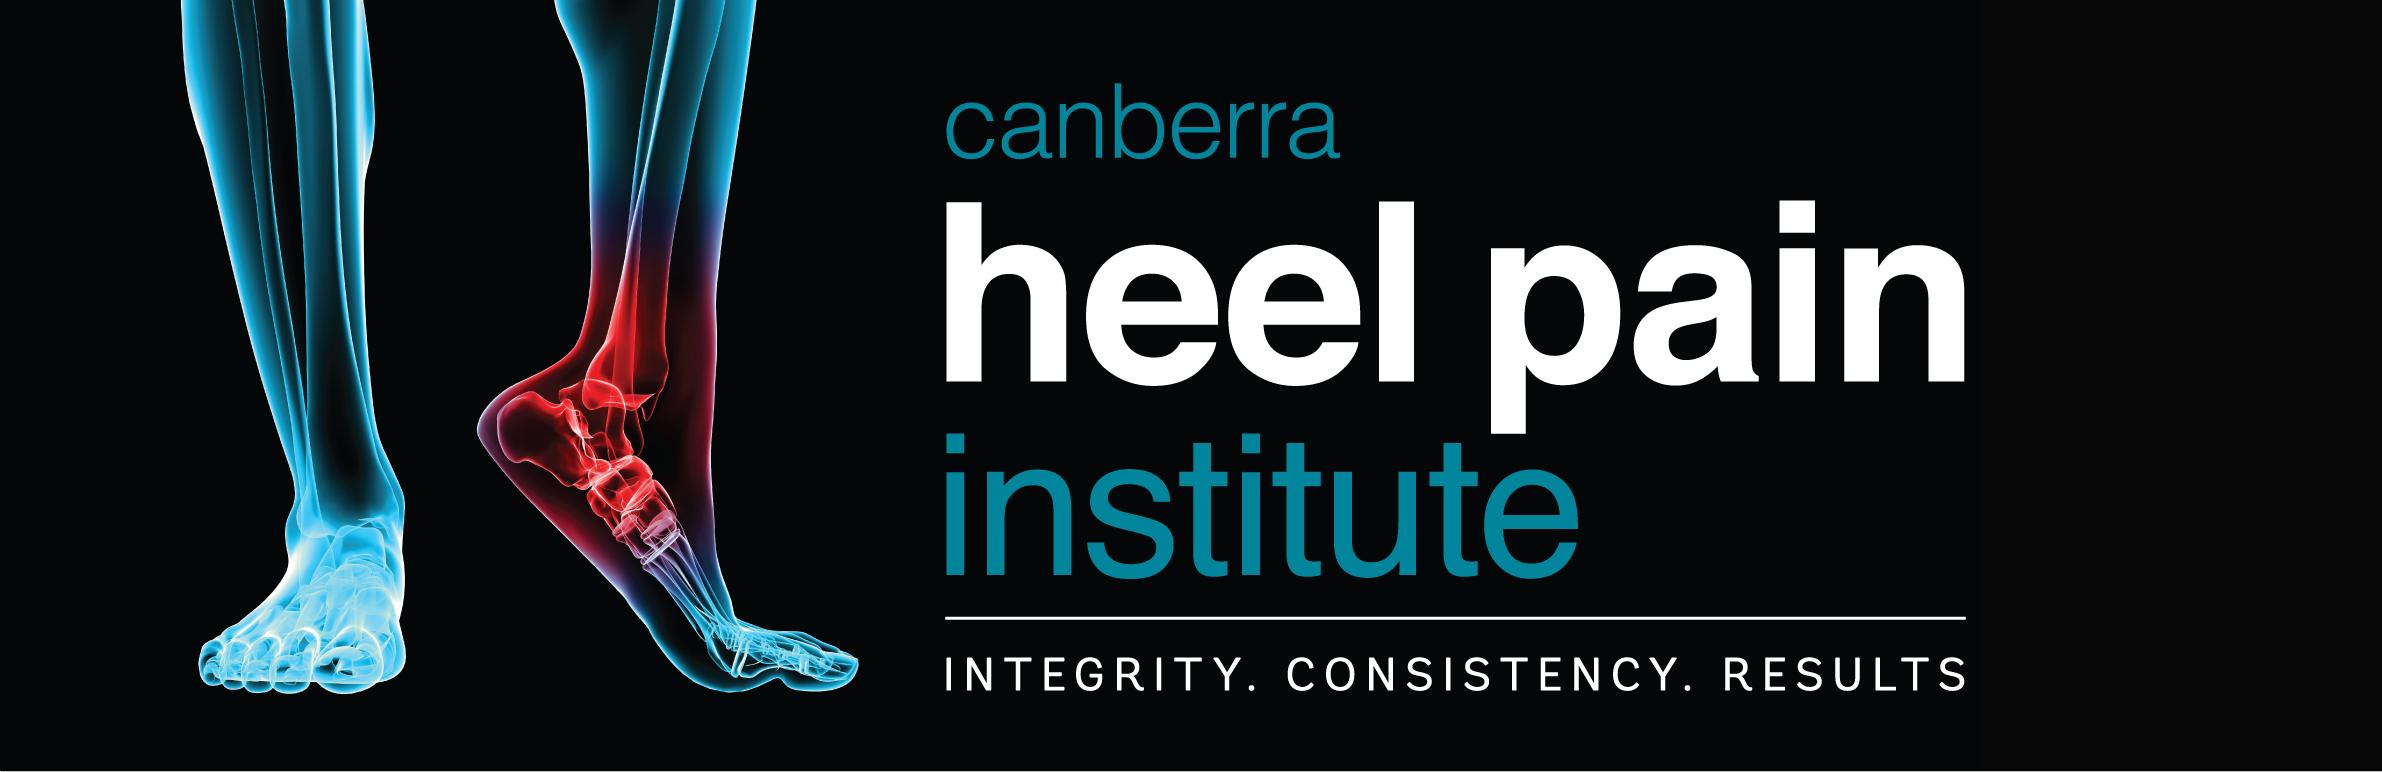 Canberra Heel Pain Institute